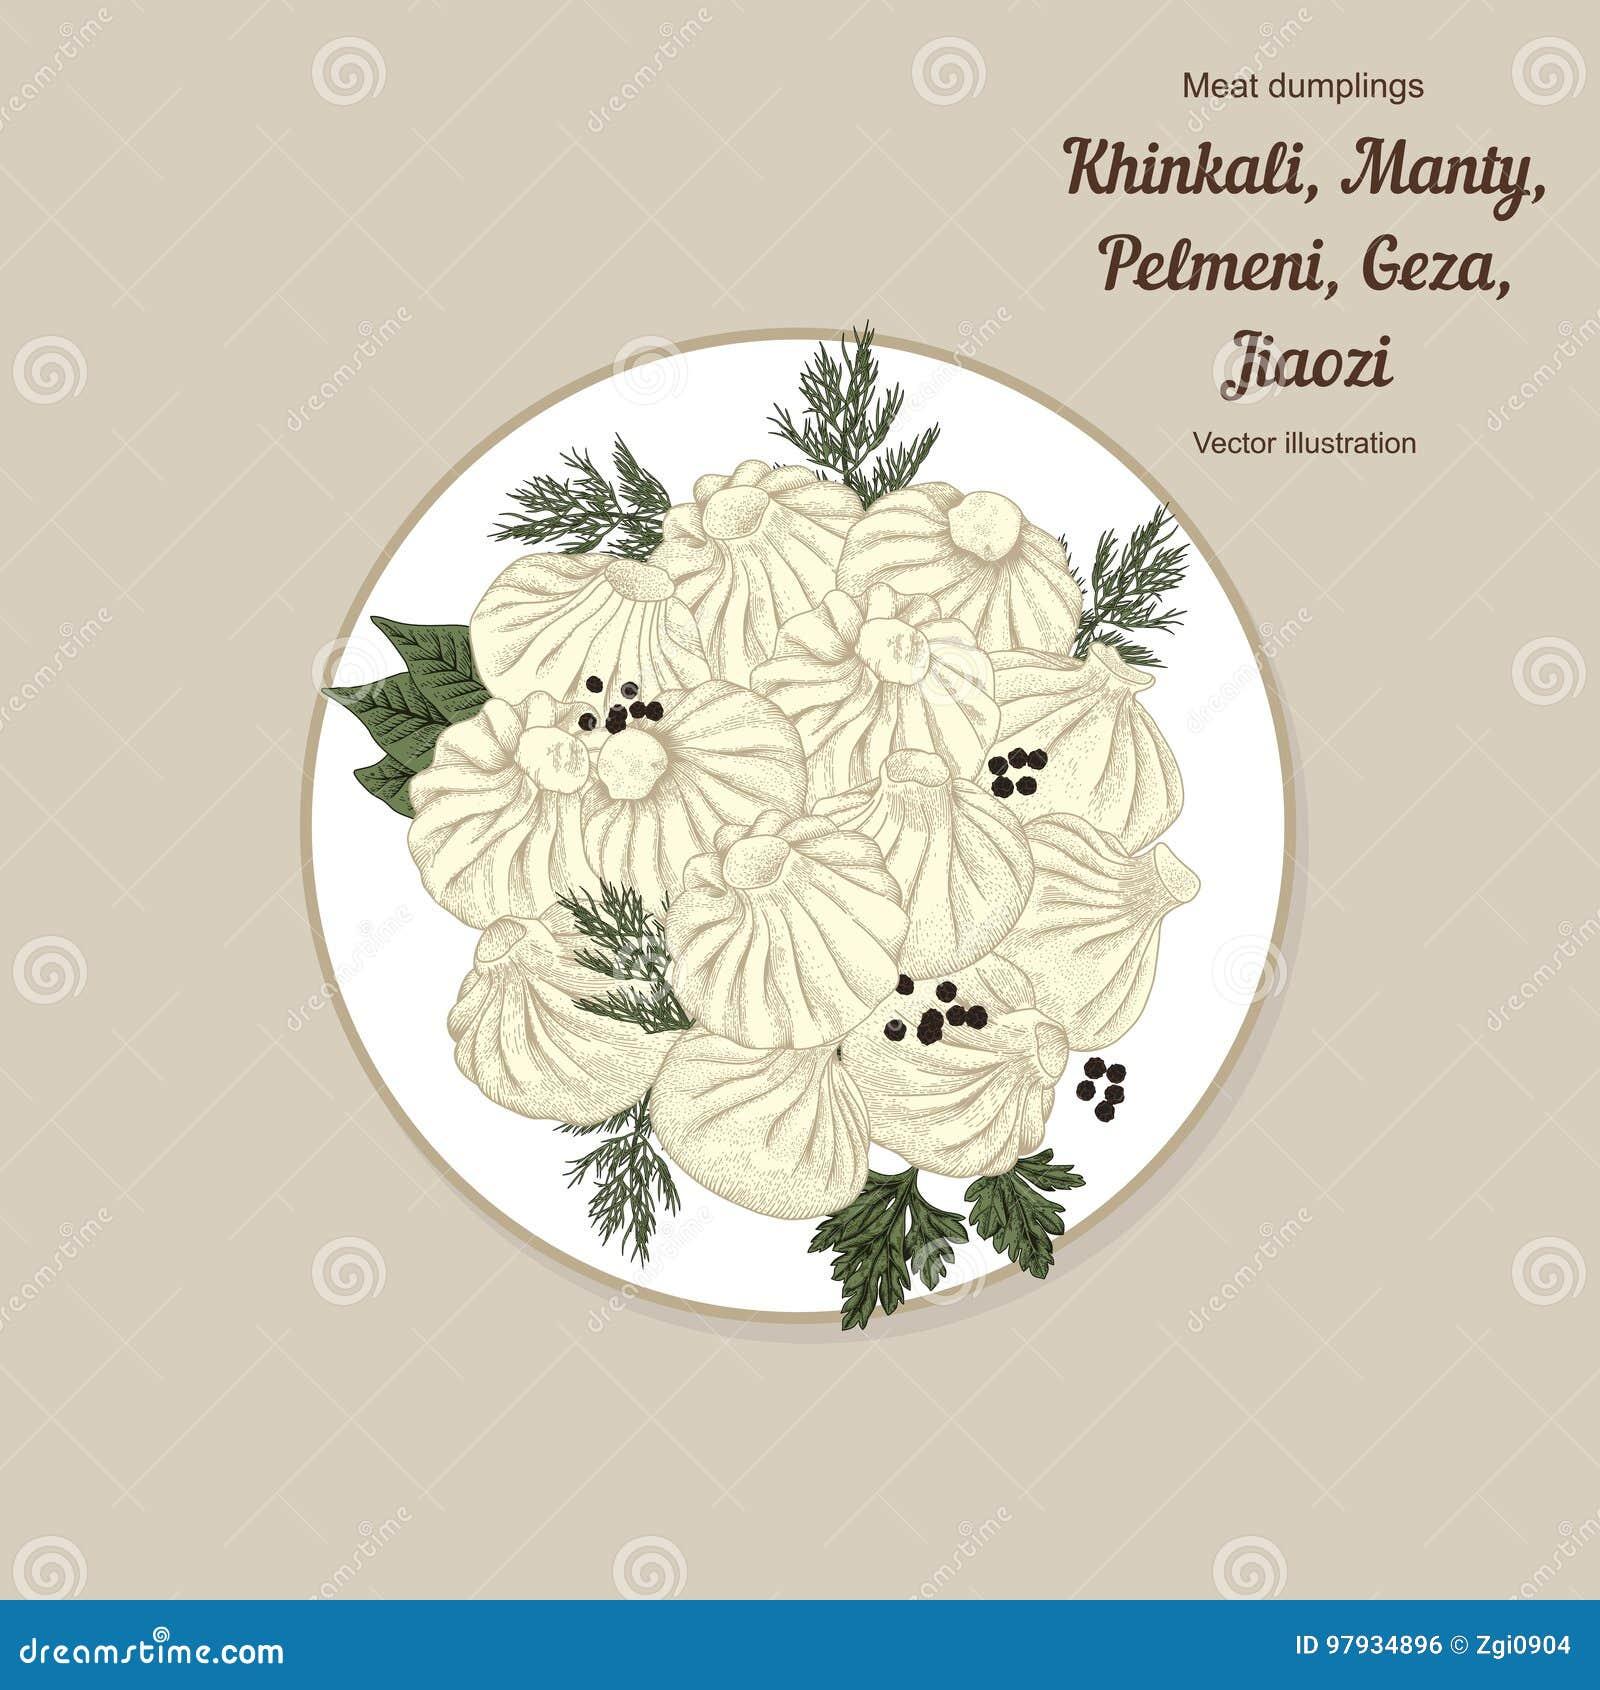 Kinkali, manti, bolas de masa hervida Geza, Jiaozi Pelmeni Bolas de masa hervida de la carne Alimento Pelmeni Bolas de masa hervi